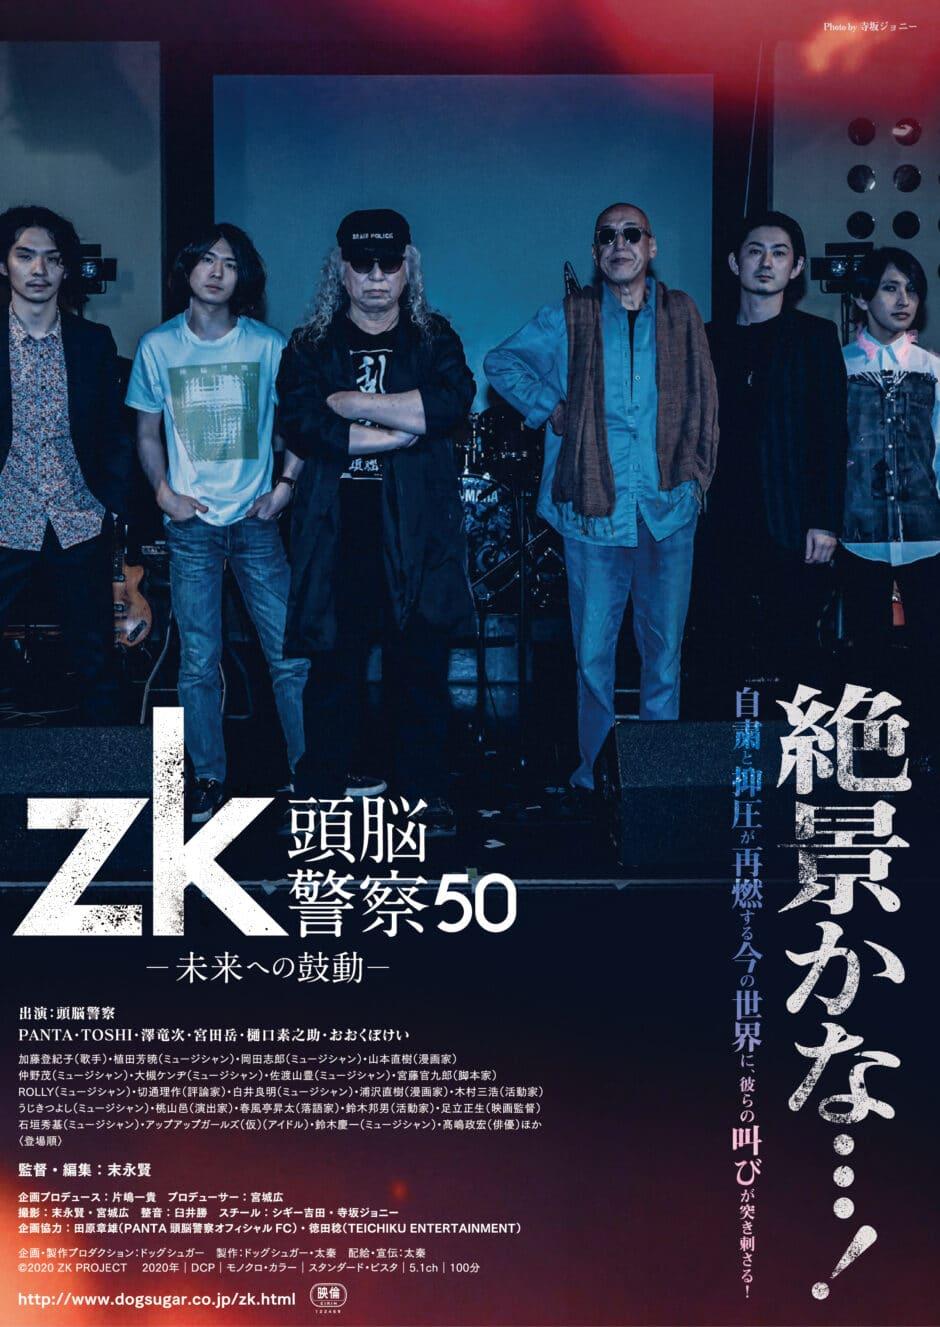 『zk/頭脳警察50 未来への鼓動』メインビジュアル、予告編